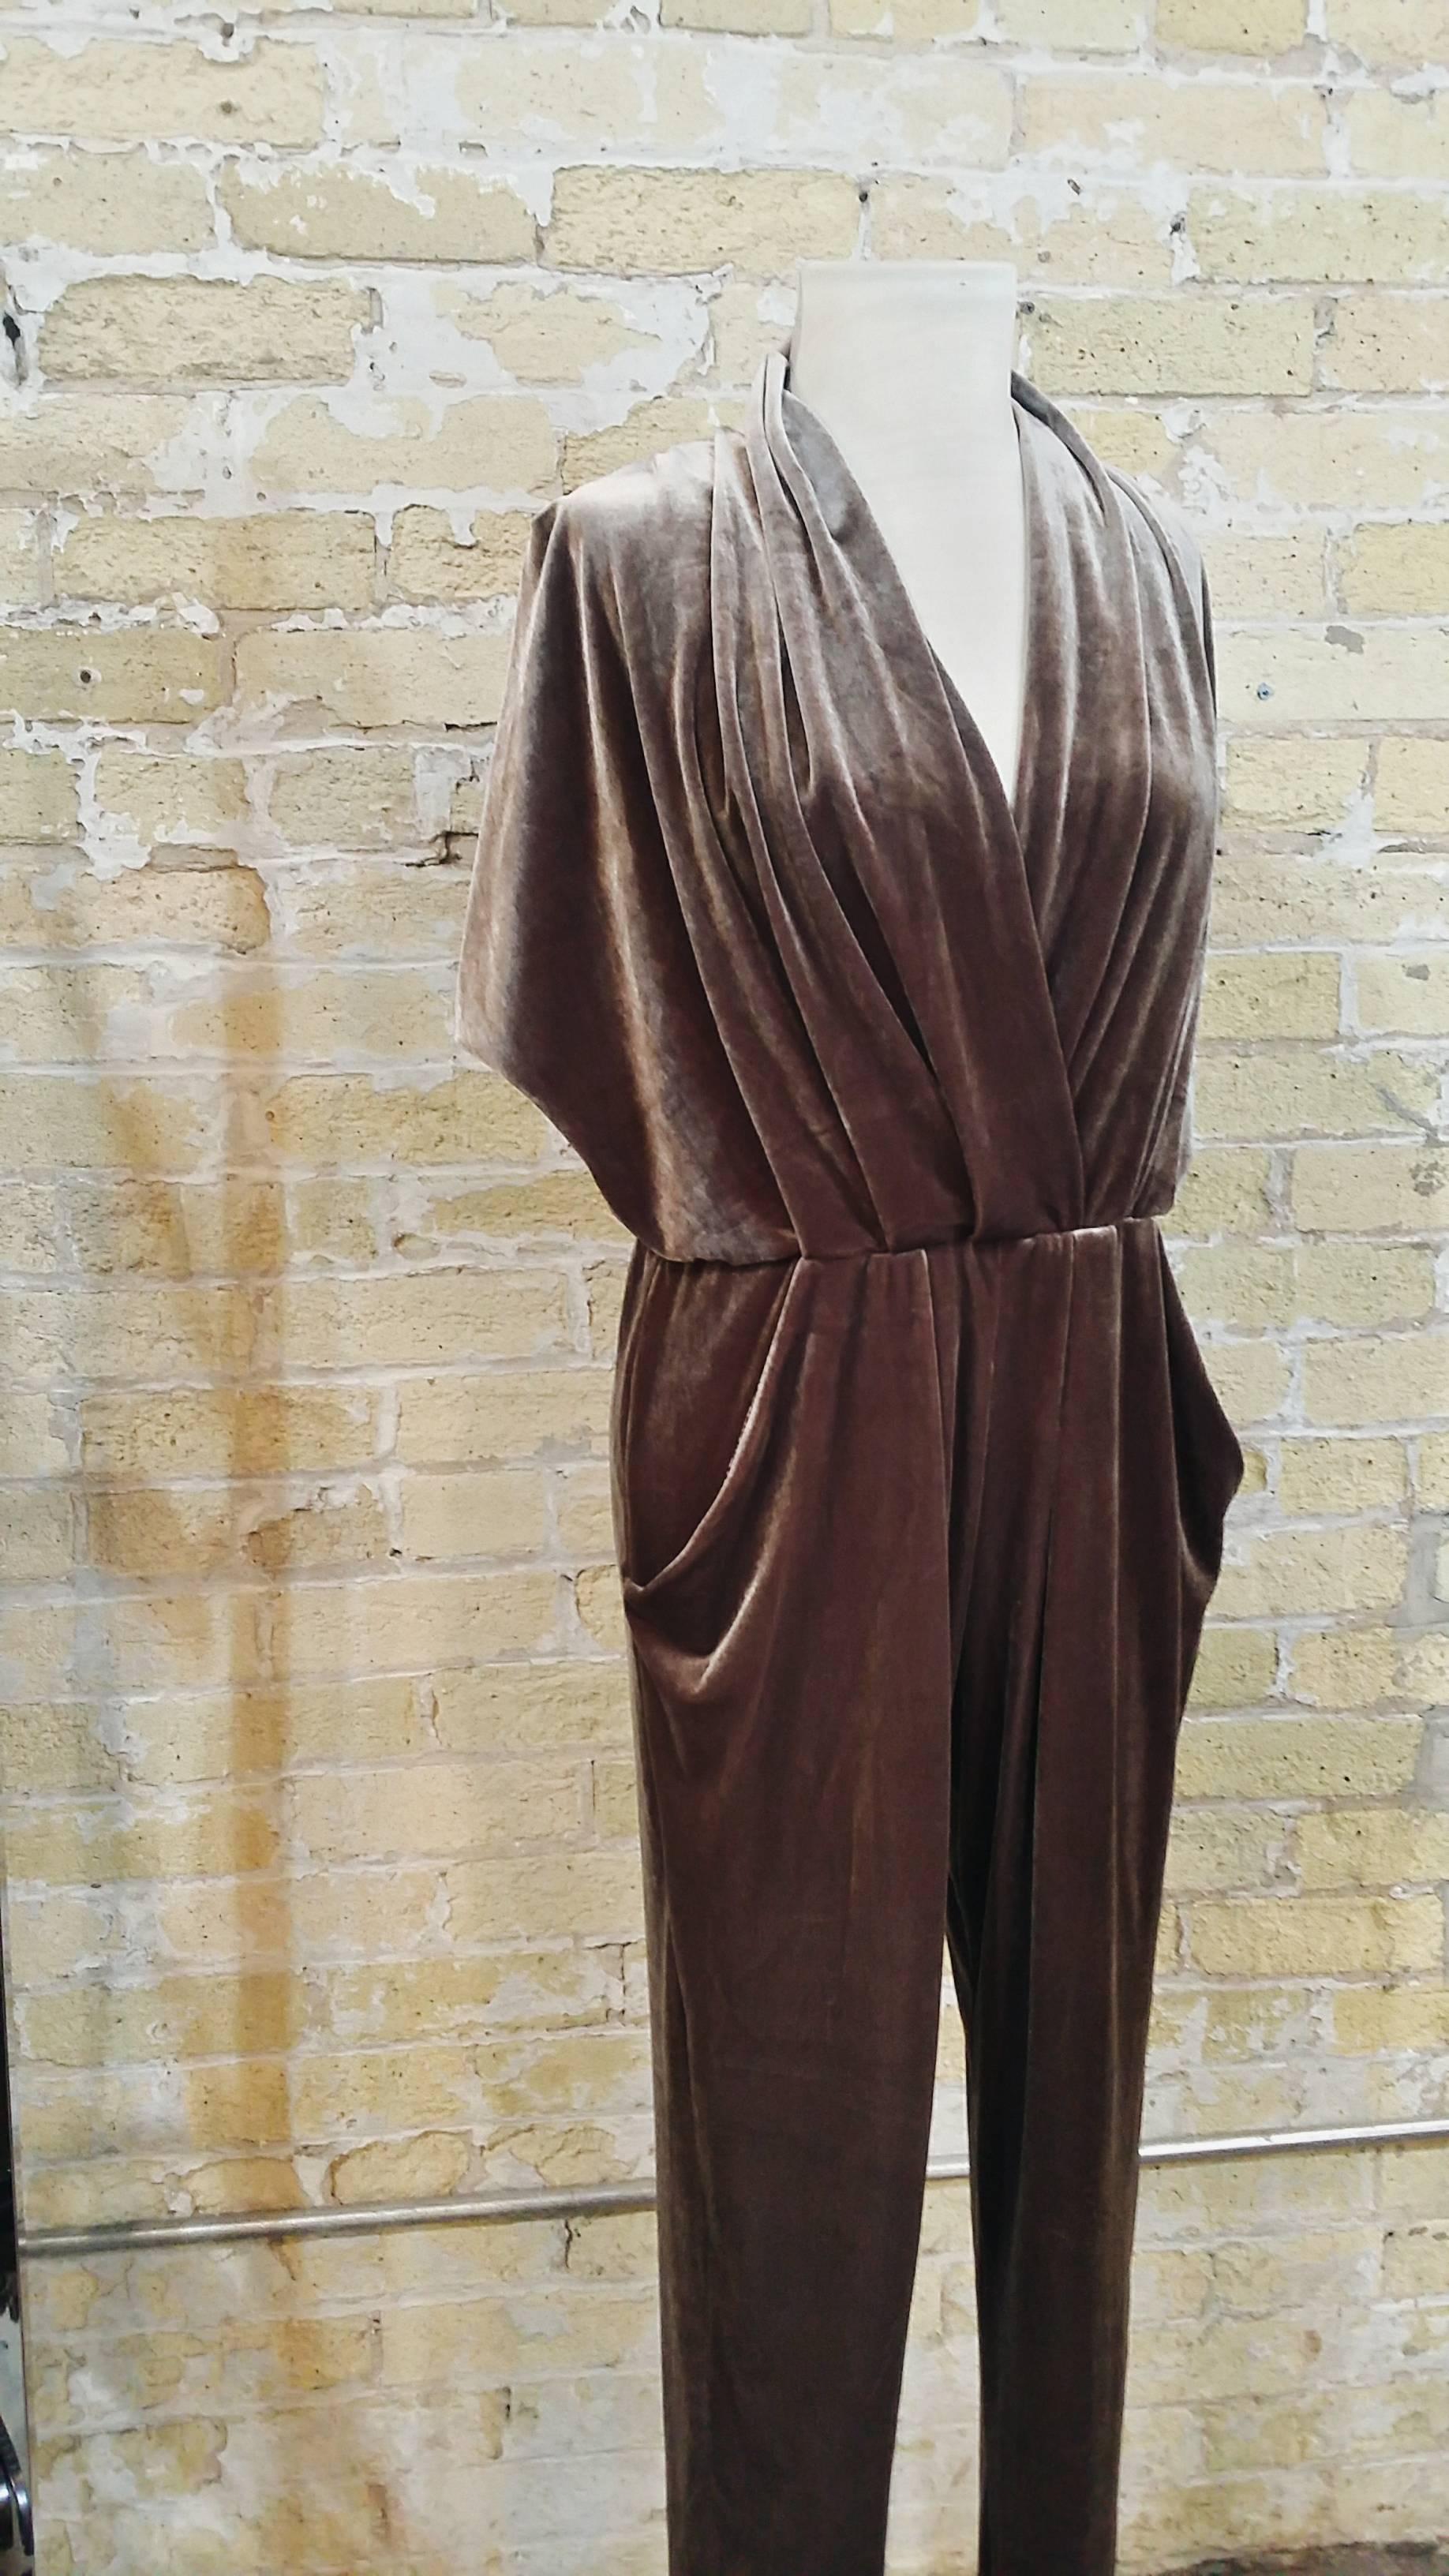 MEG Velvet Jumpsuit: $260 (available in other colors)